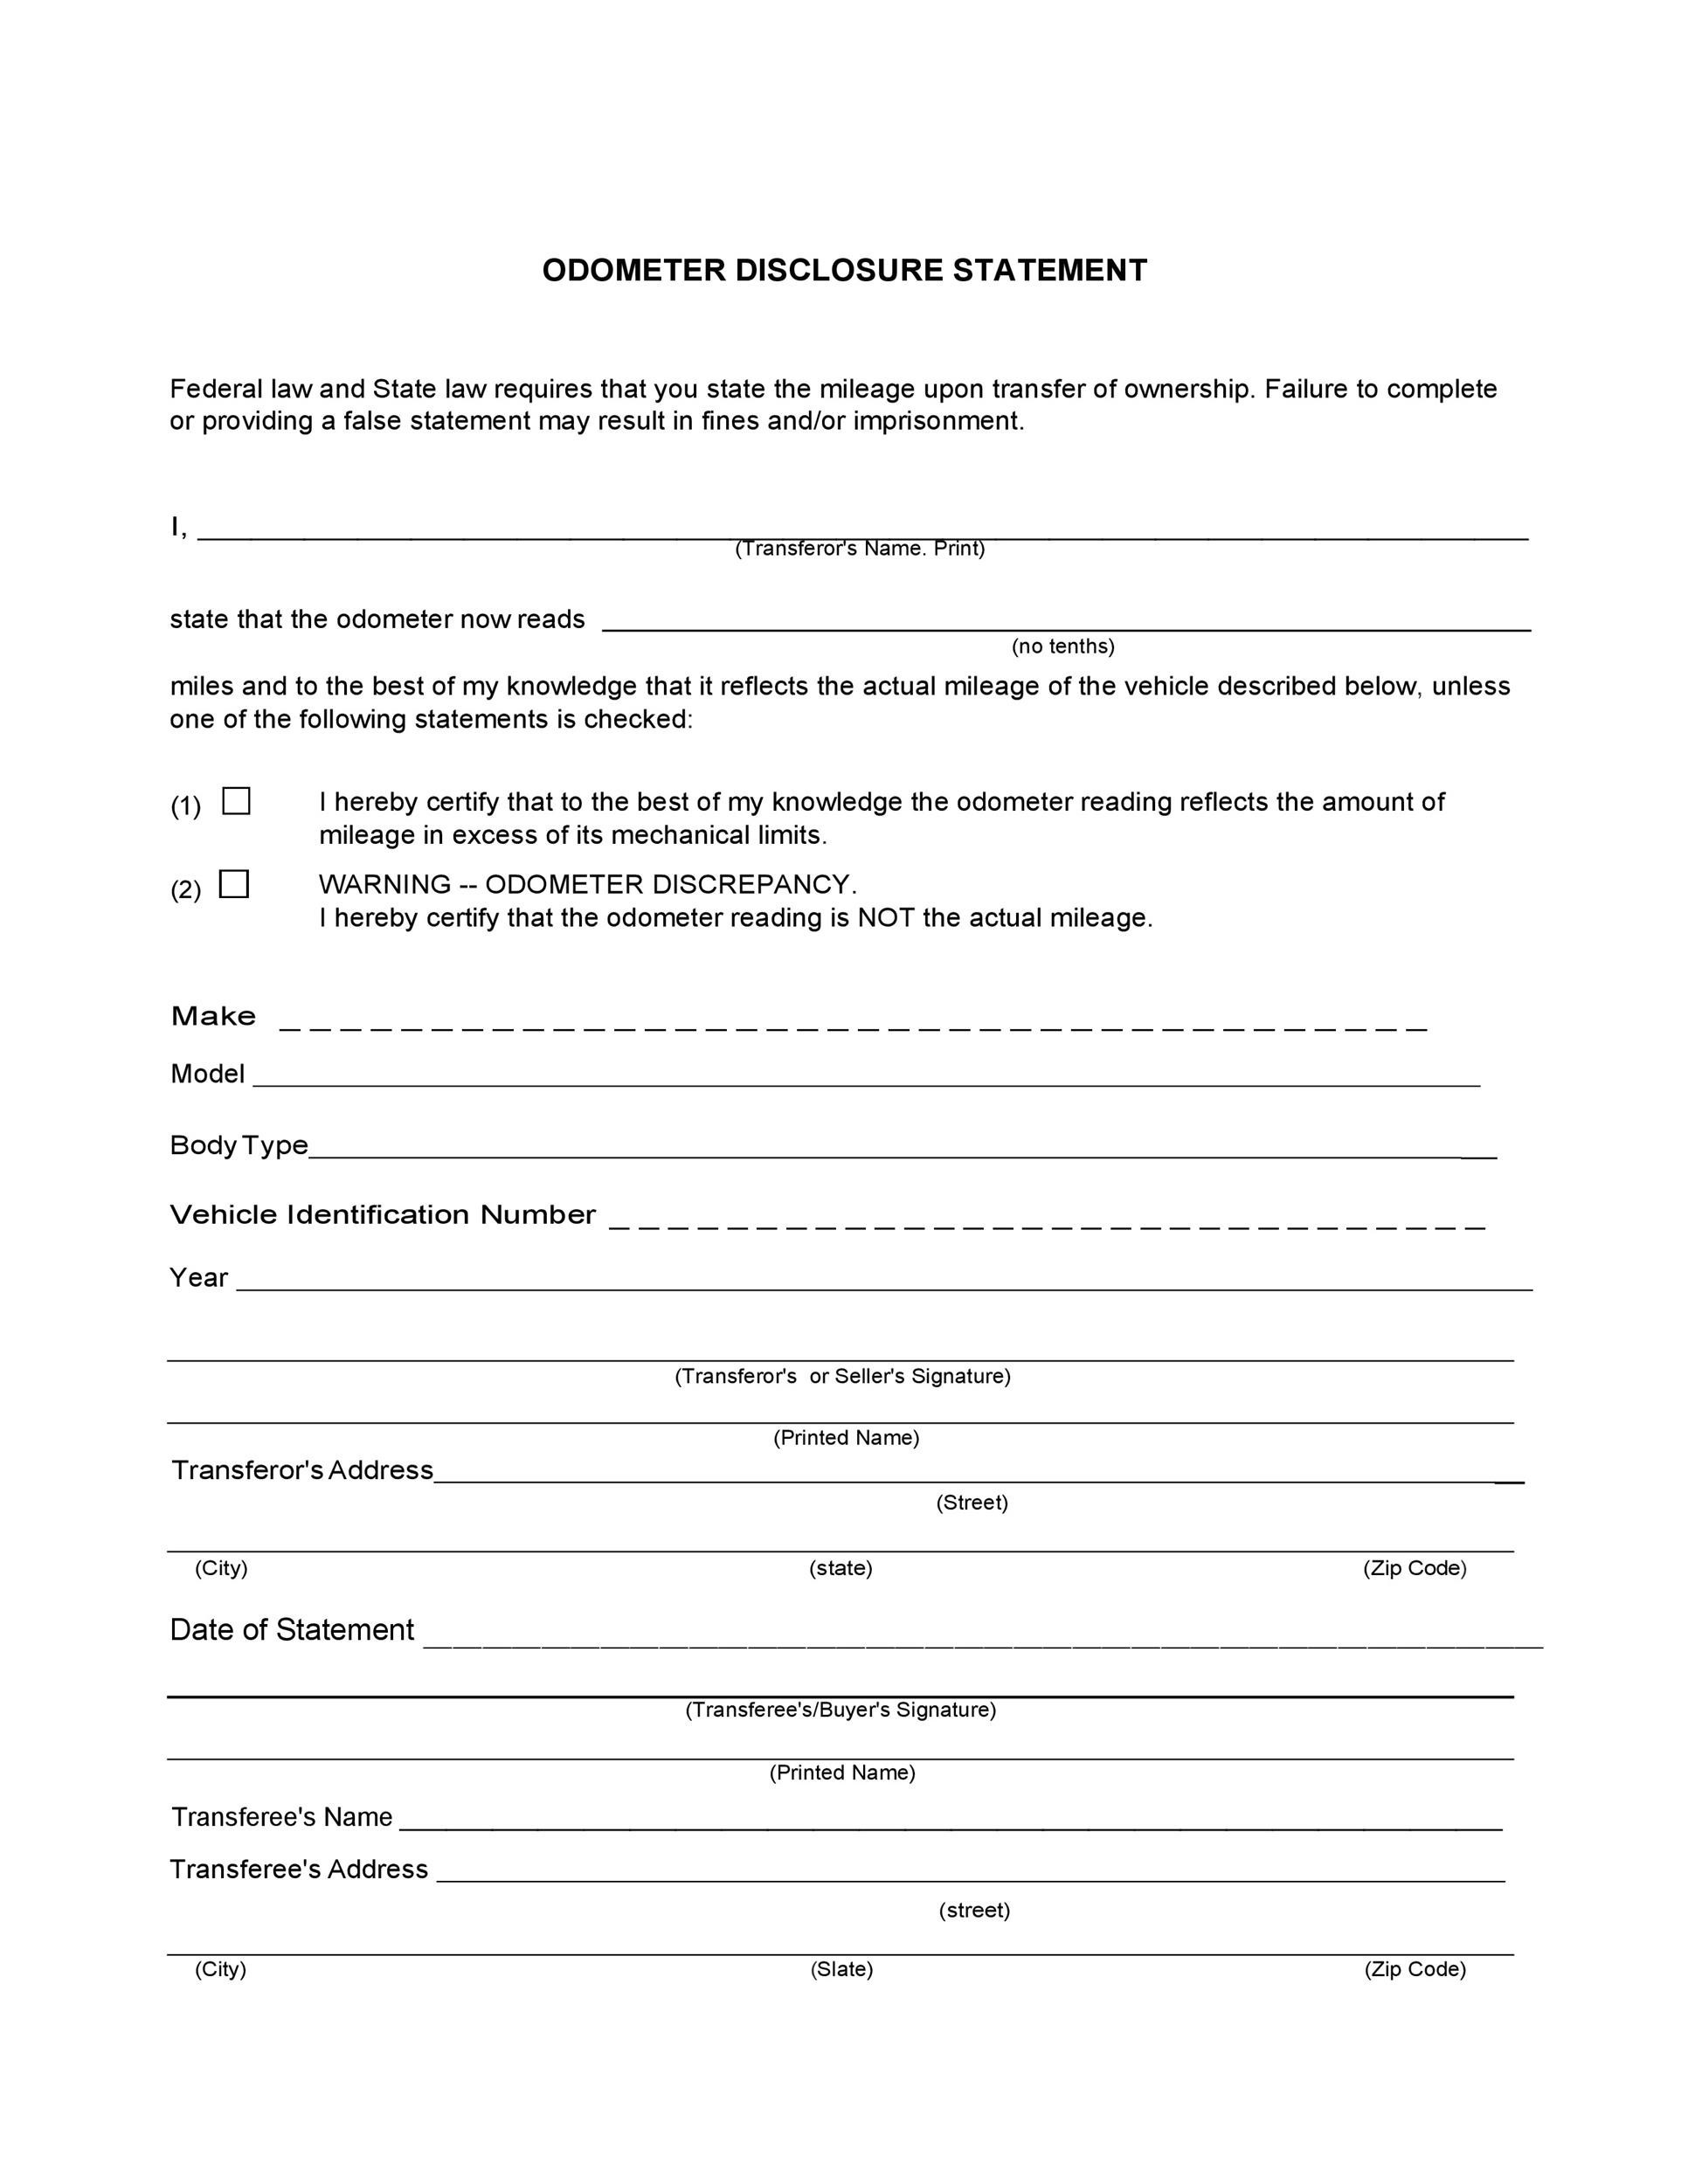 Free odometer disclosure statement 36